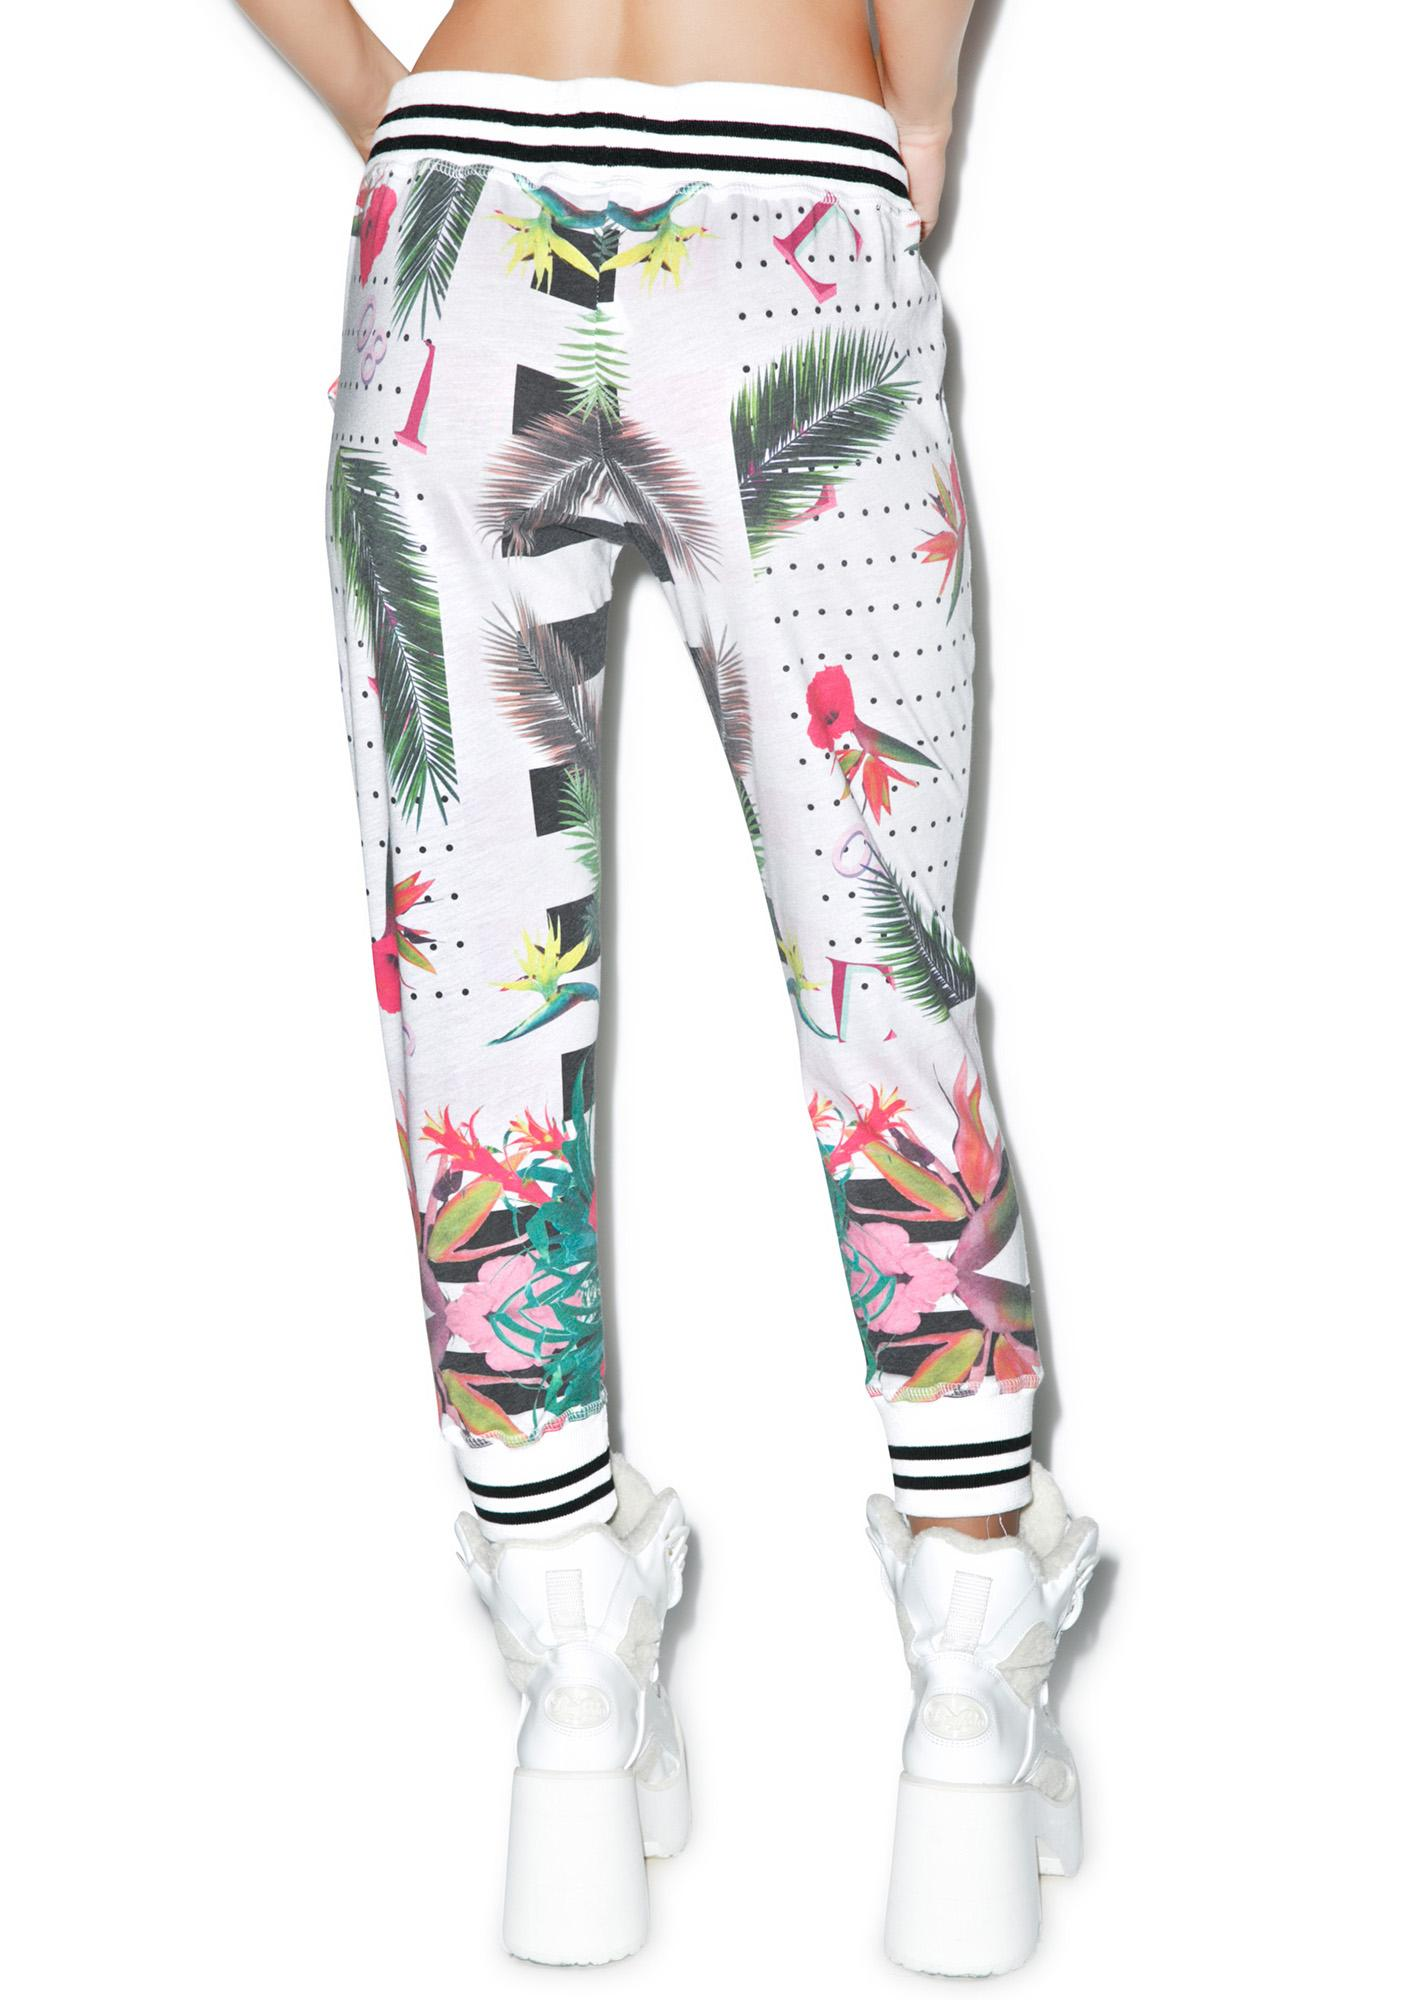 Civil Clothing Floral Capri Runners